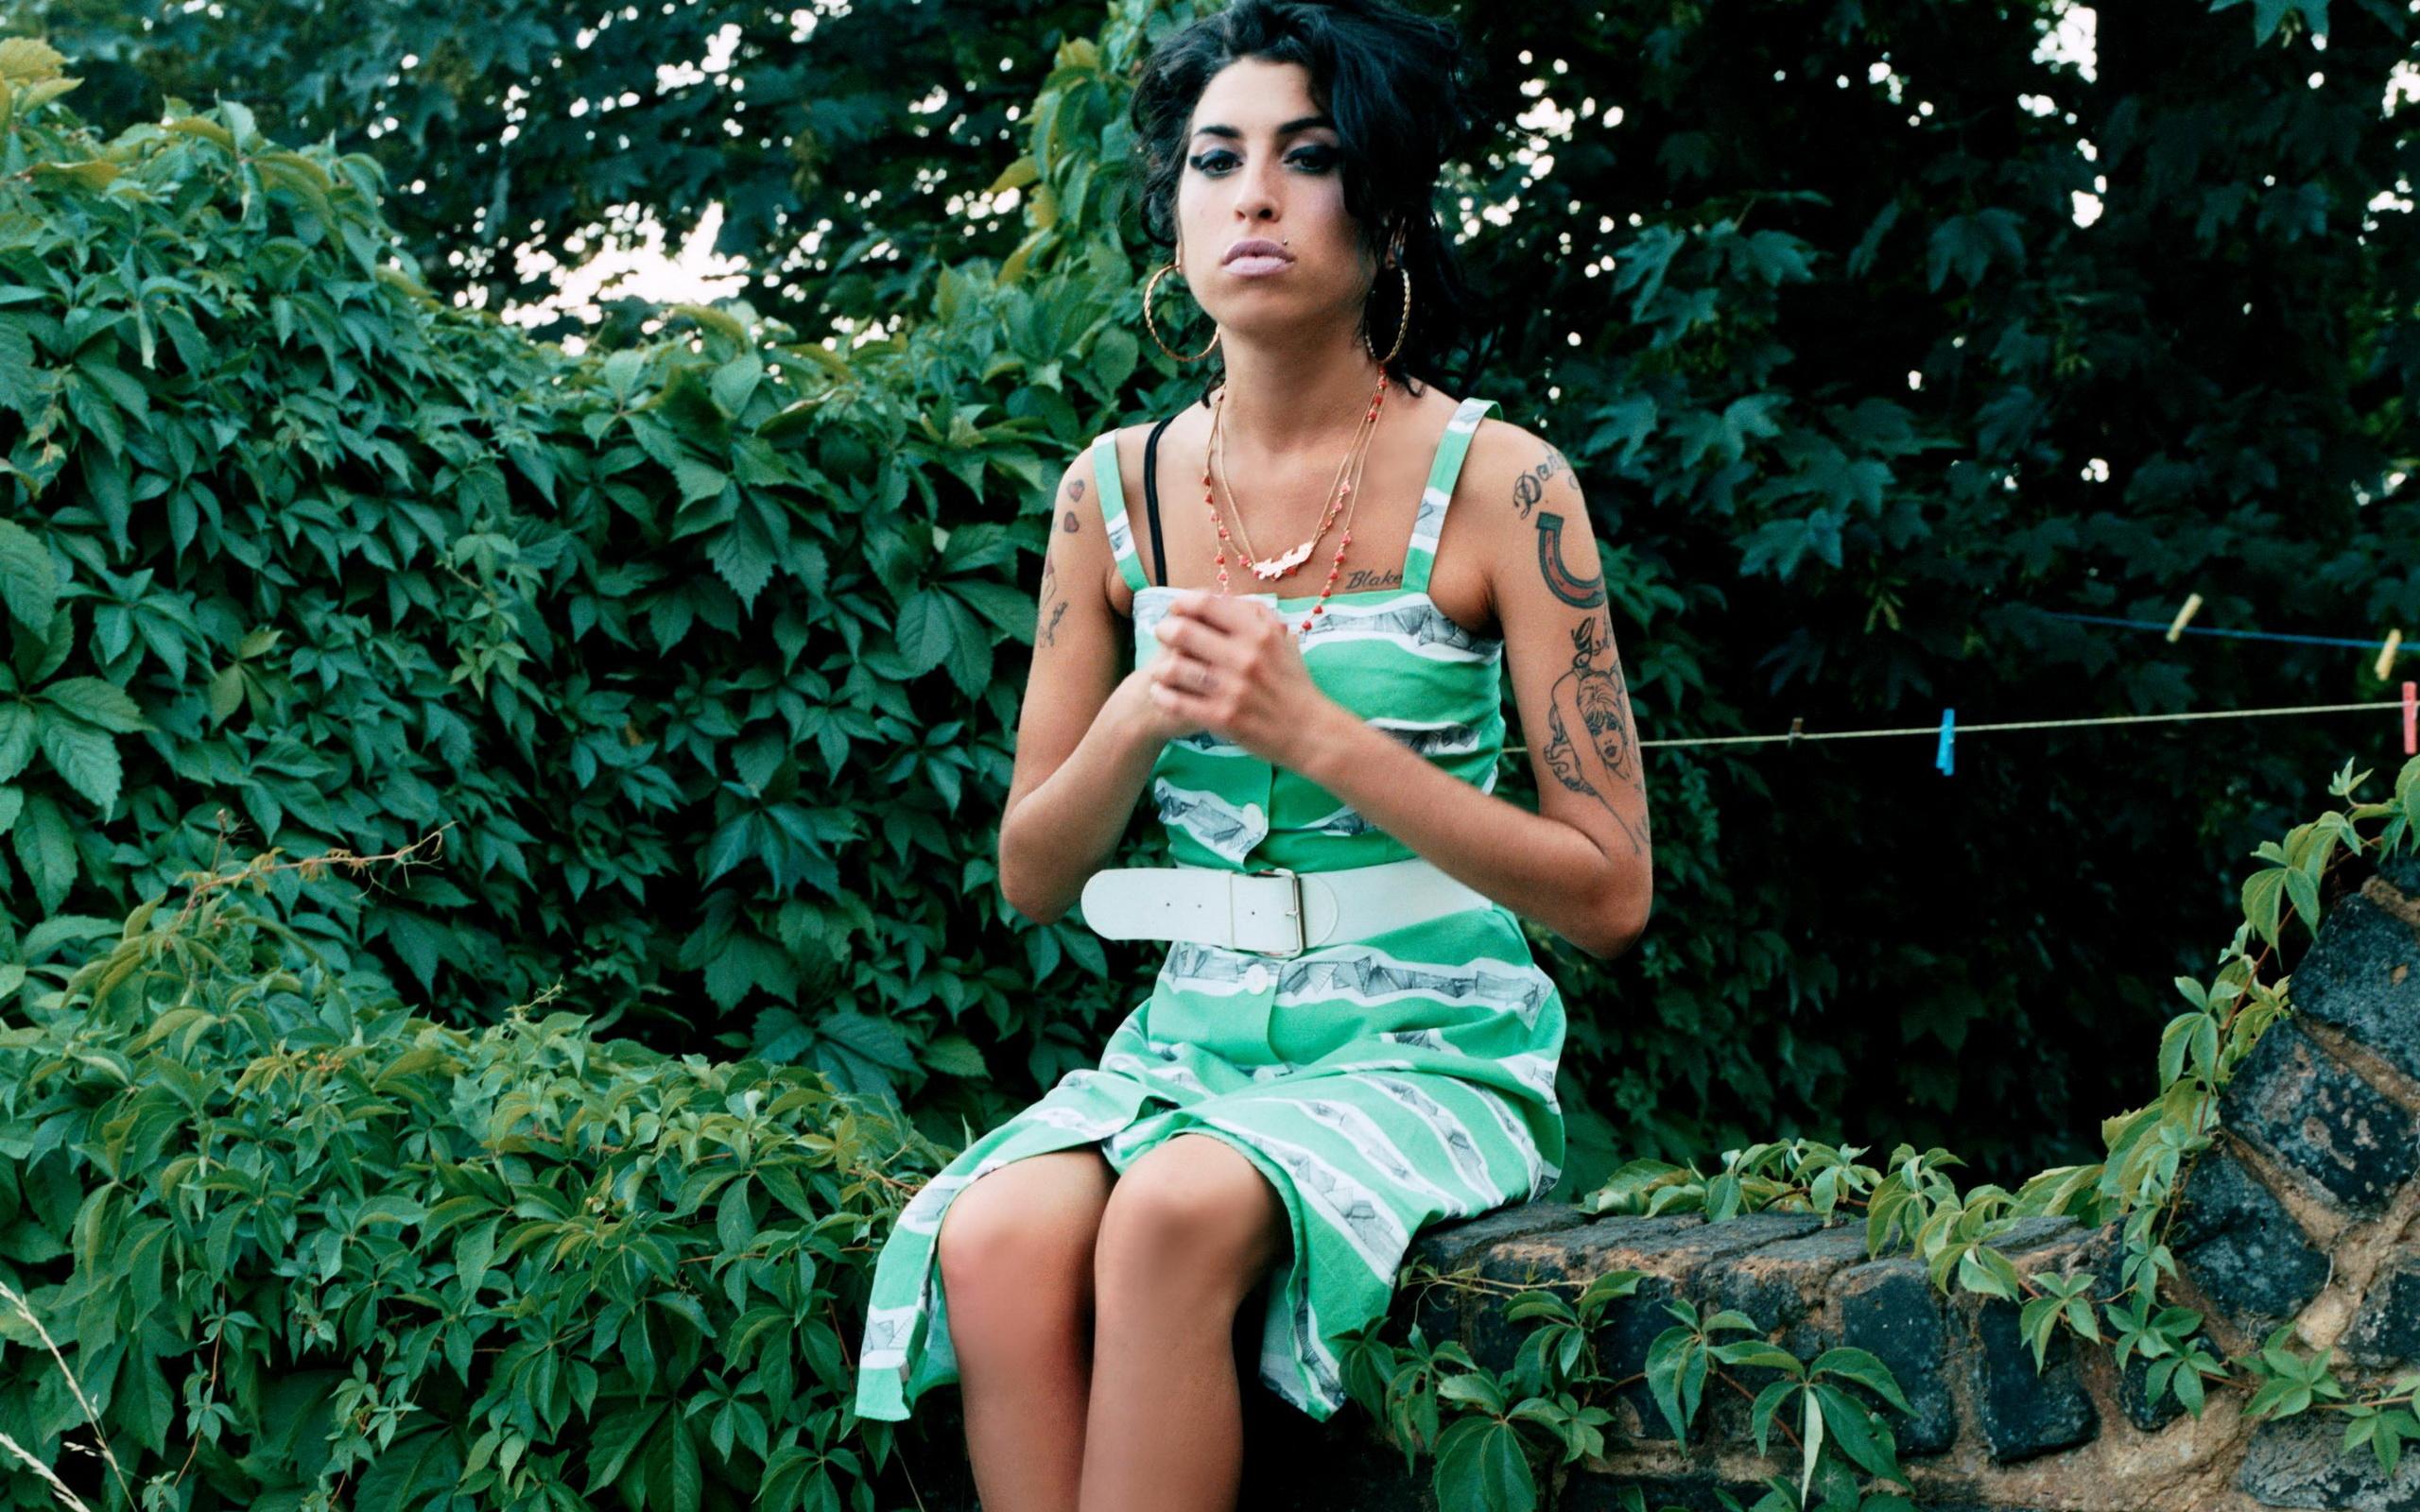 Hd Wallpaper Girl Face 12 Hd Amy Winehouse Wallpapers